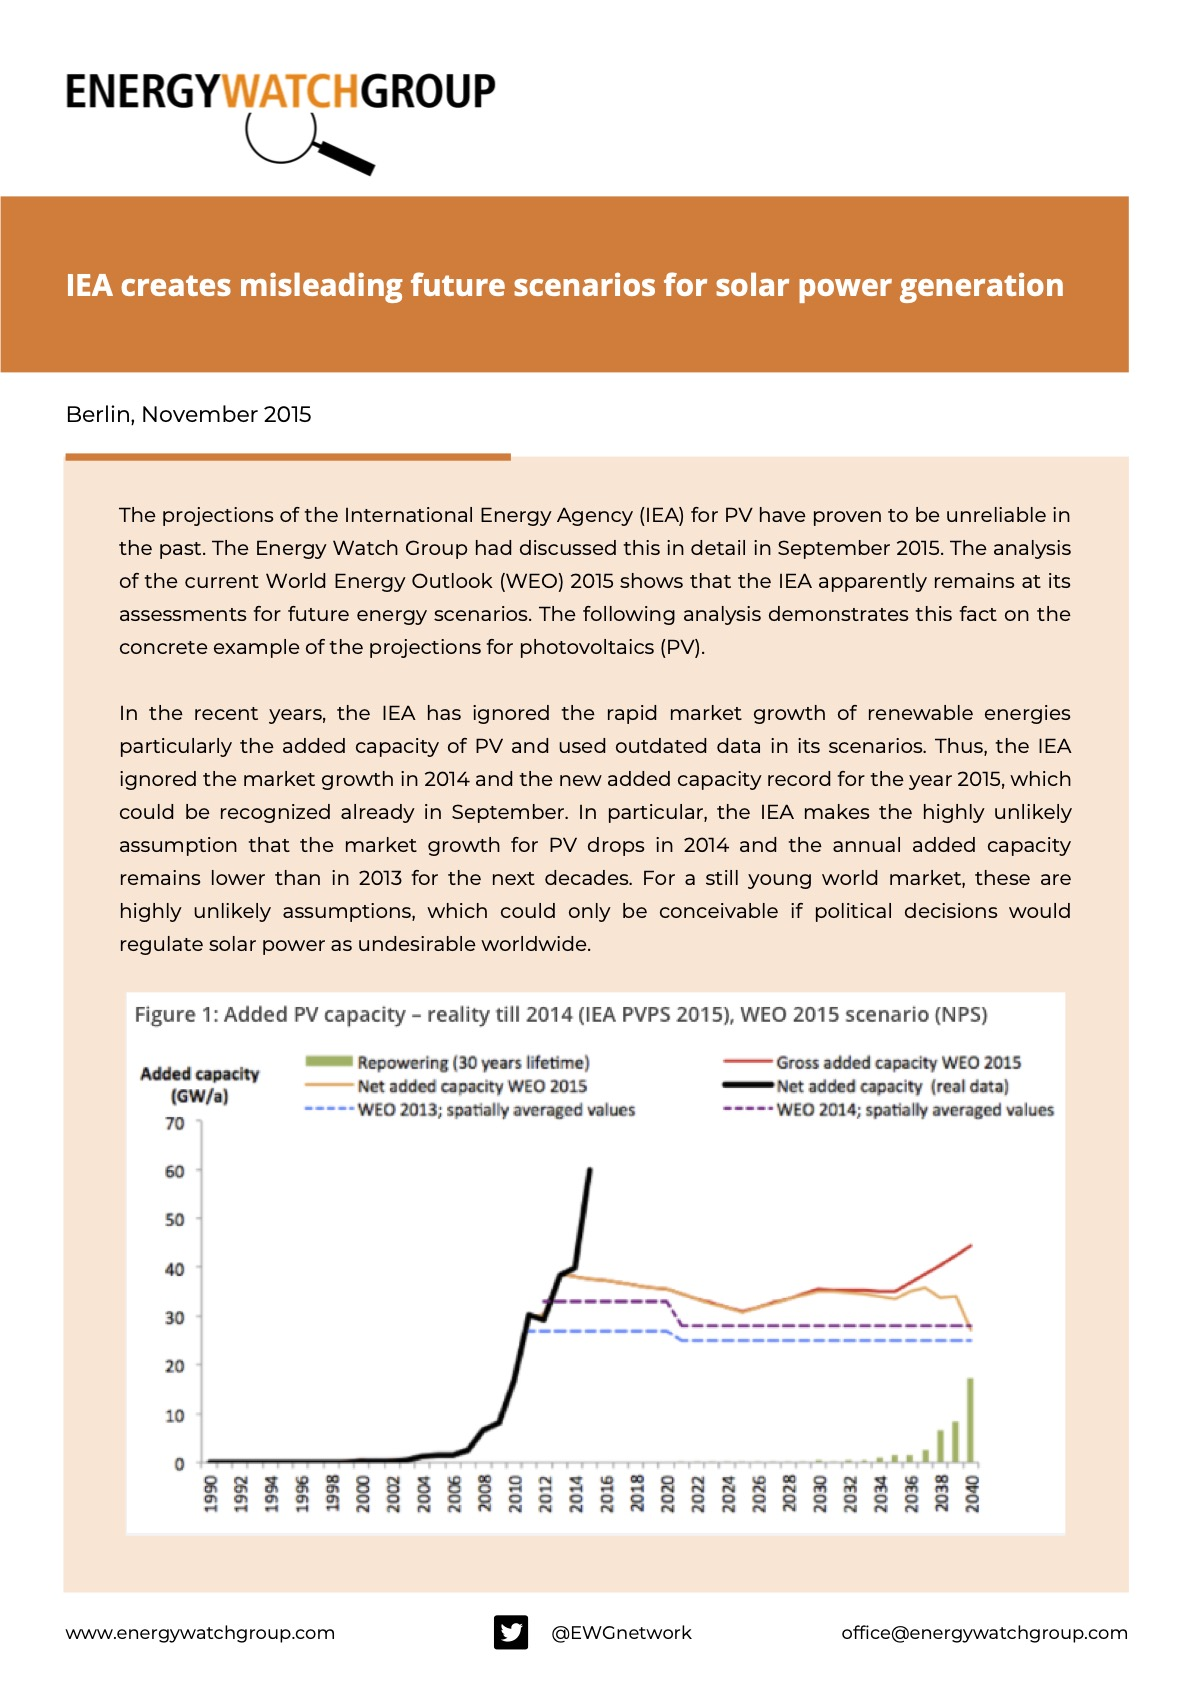 IEA creates misleading future scenarios for solar power generation